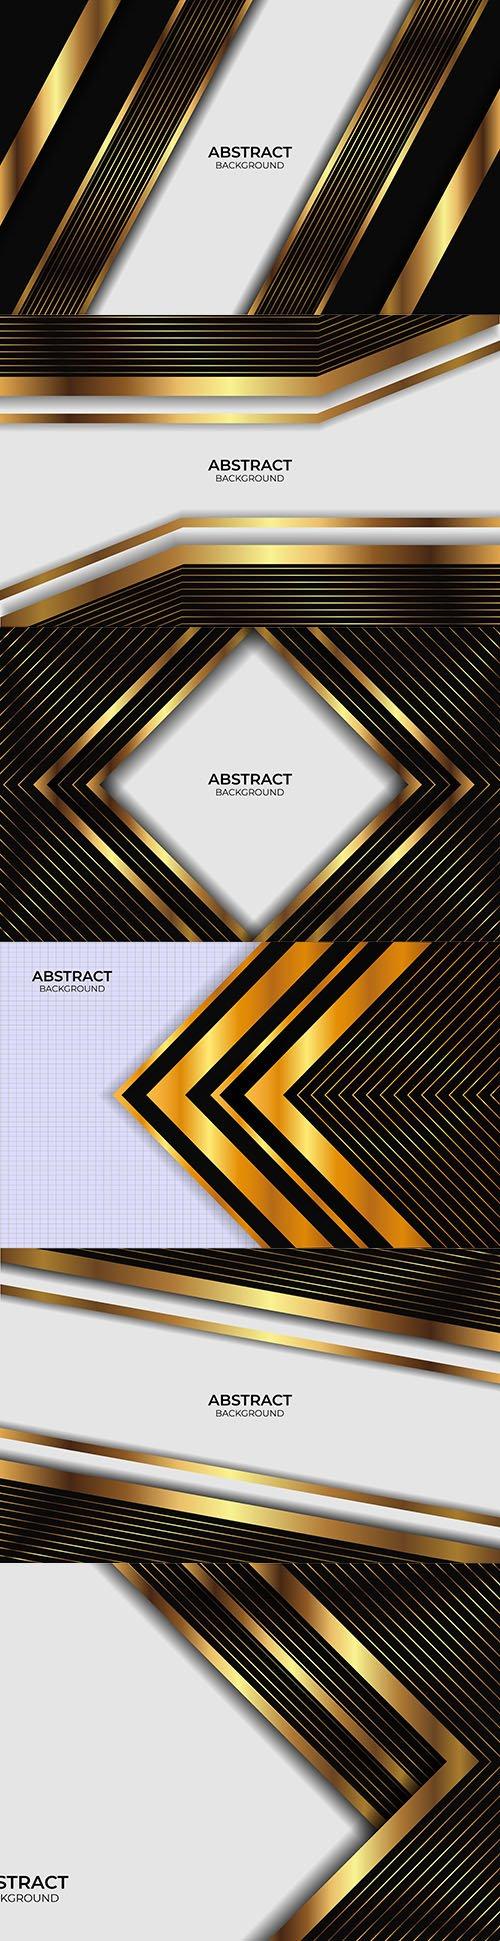 Luxury line design gold black background